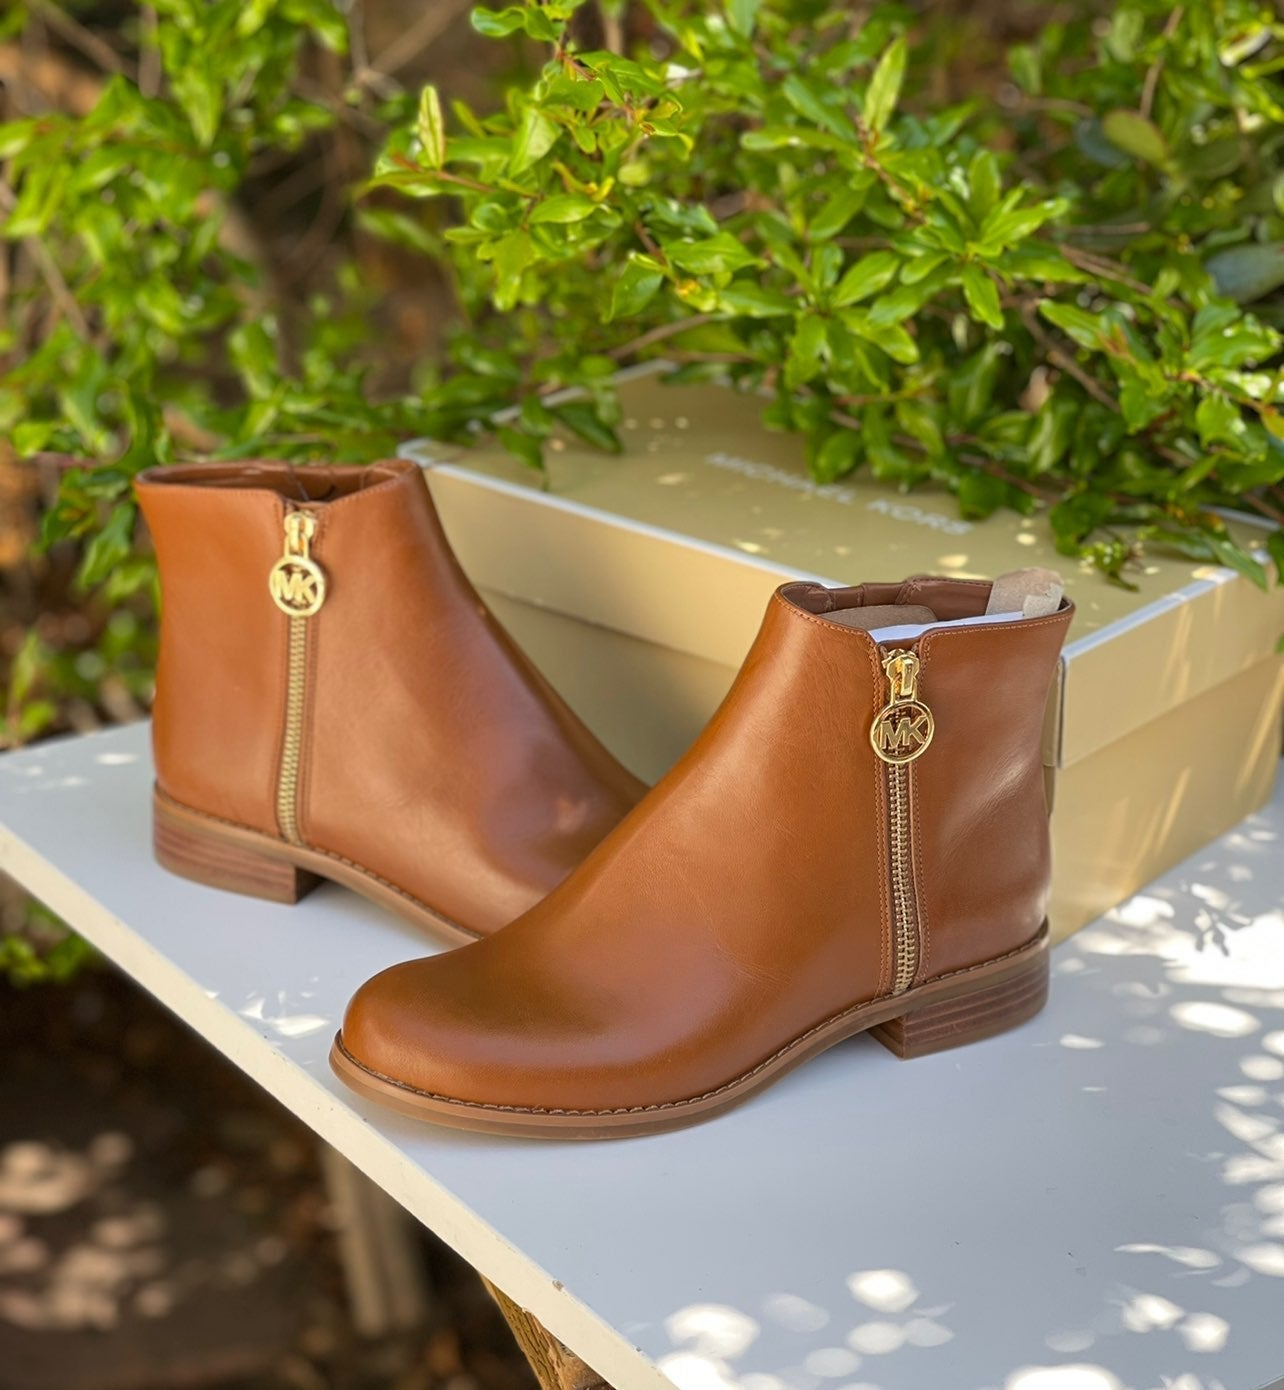 MICHAEL KORS tan leather booties 6.5